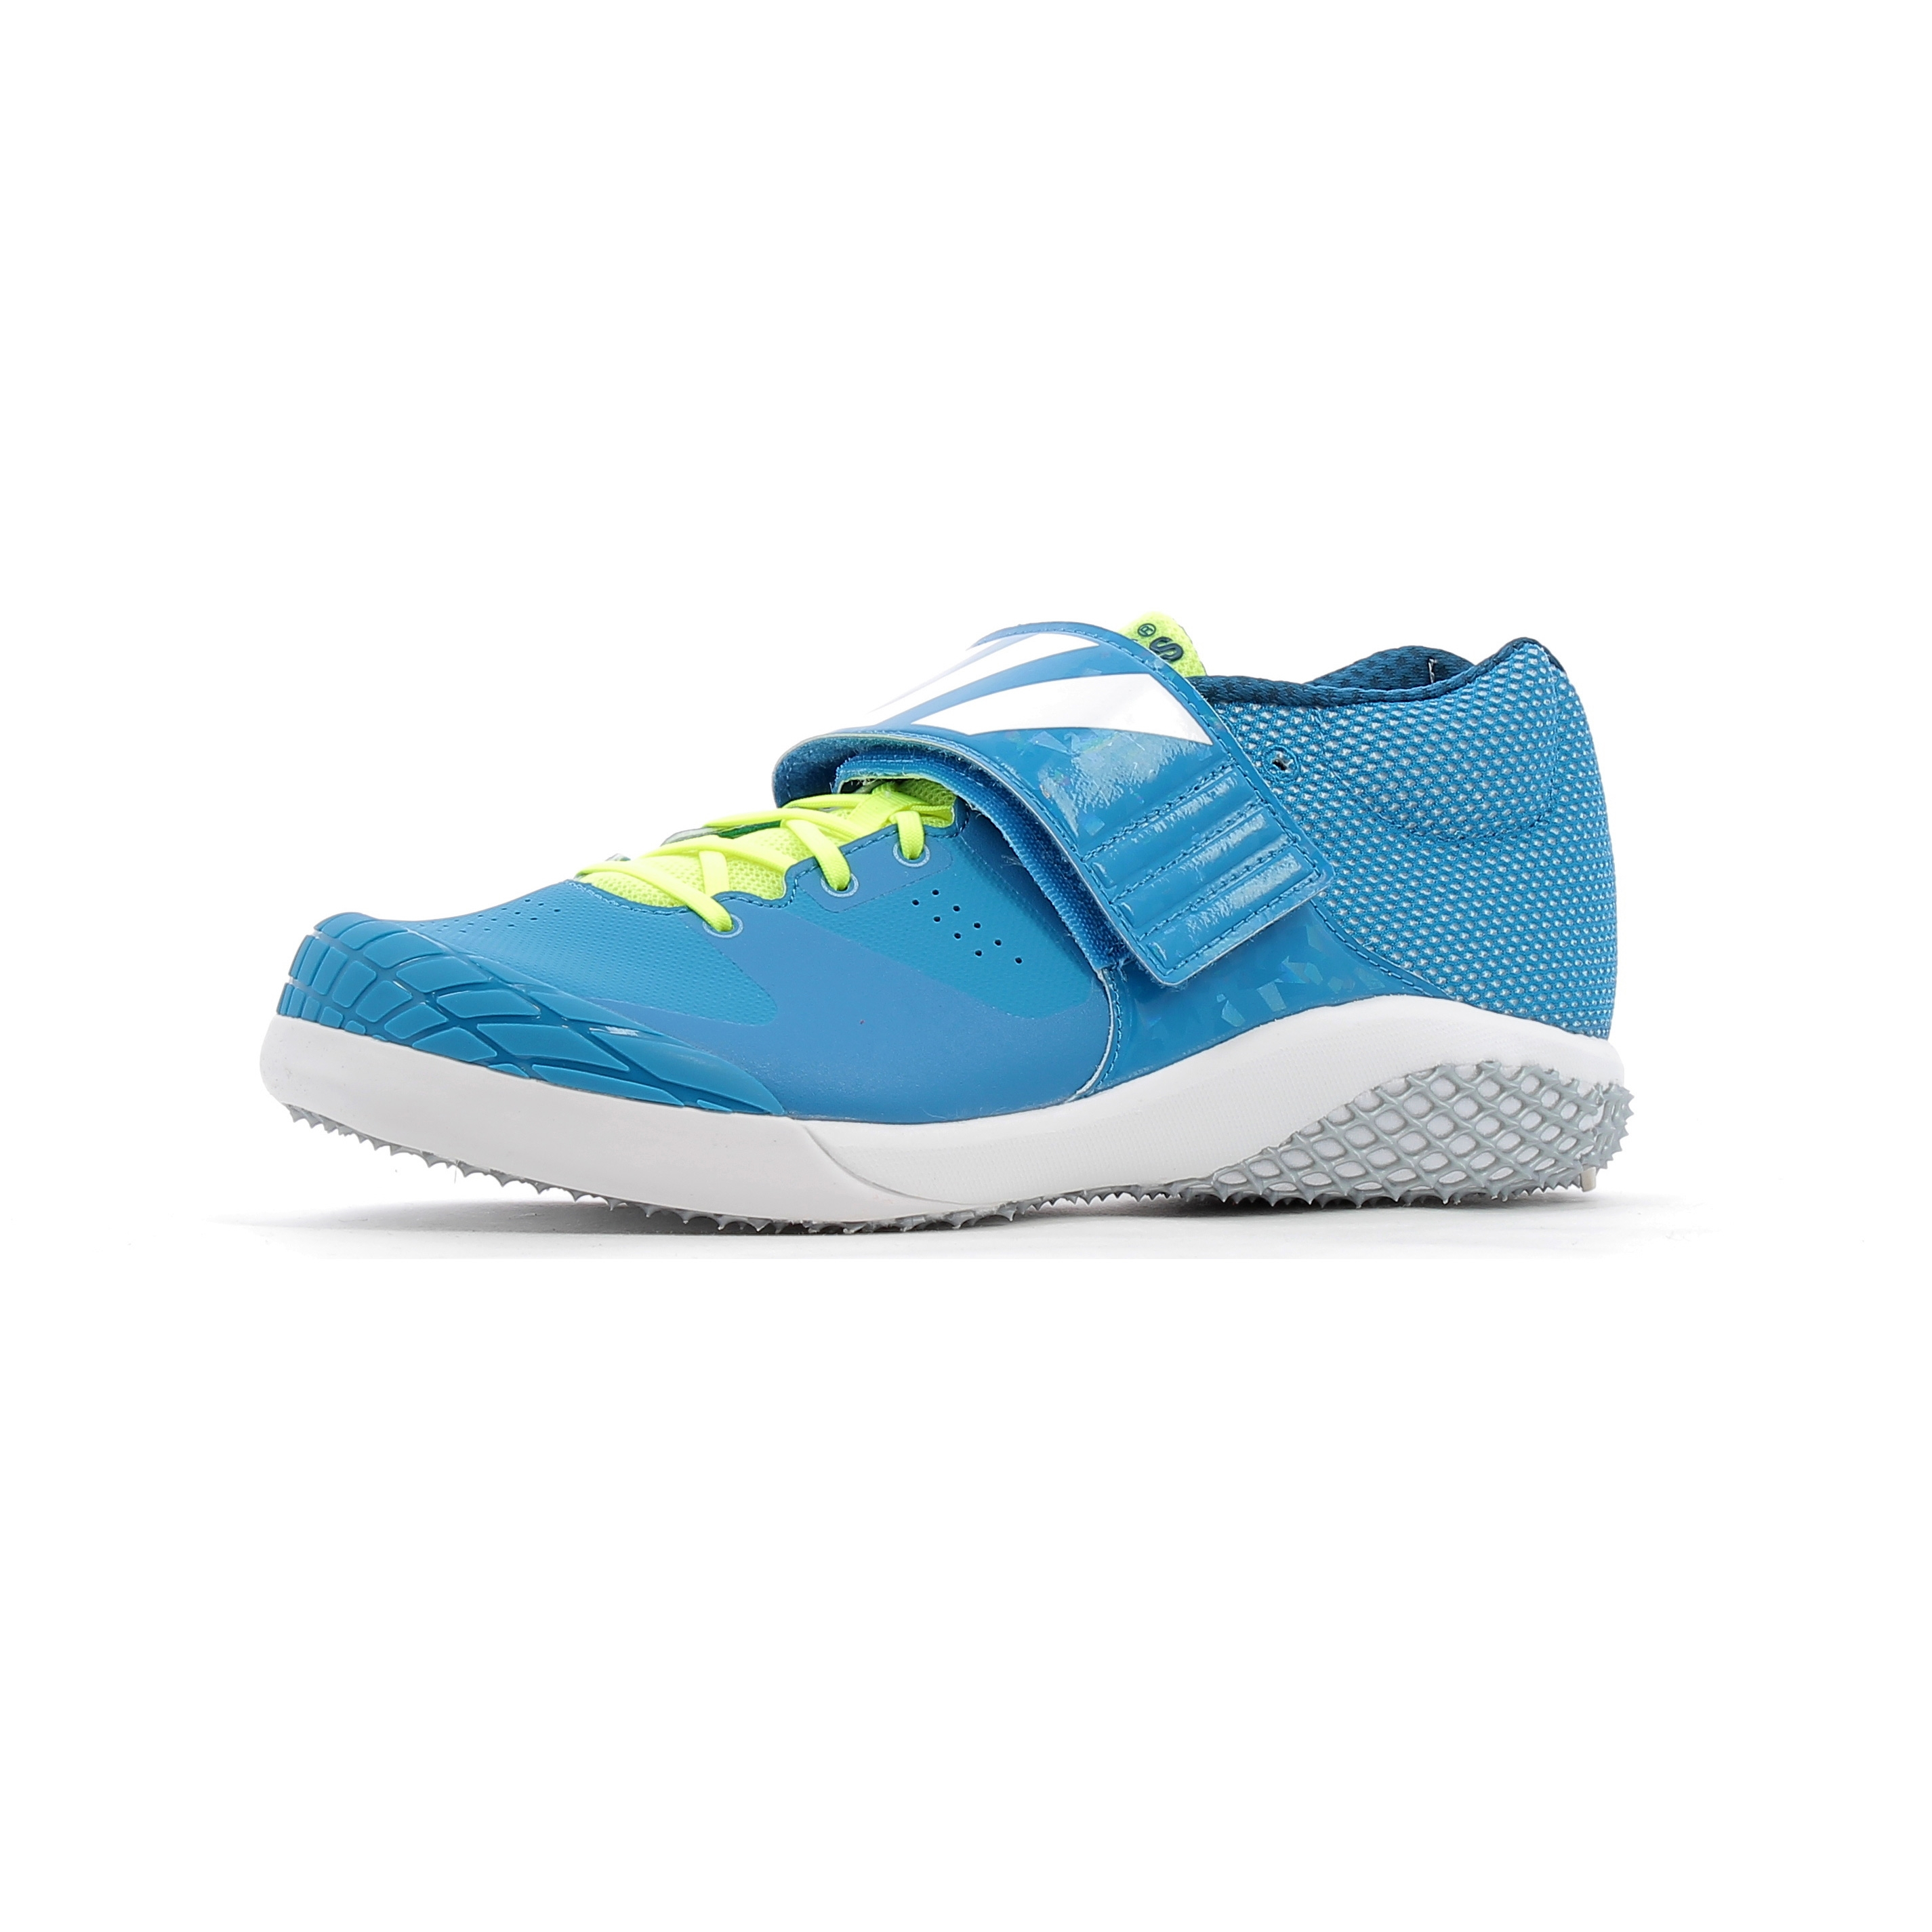 Chaussures d'athlétisme Adidas Performance Adizero Javelin